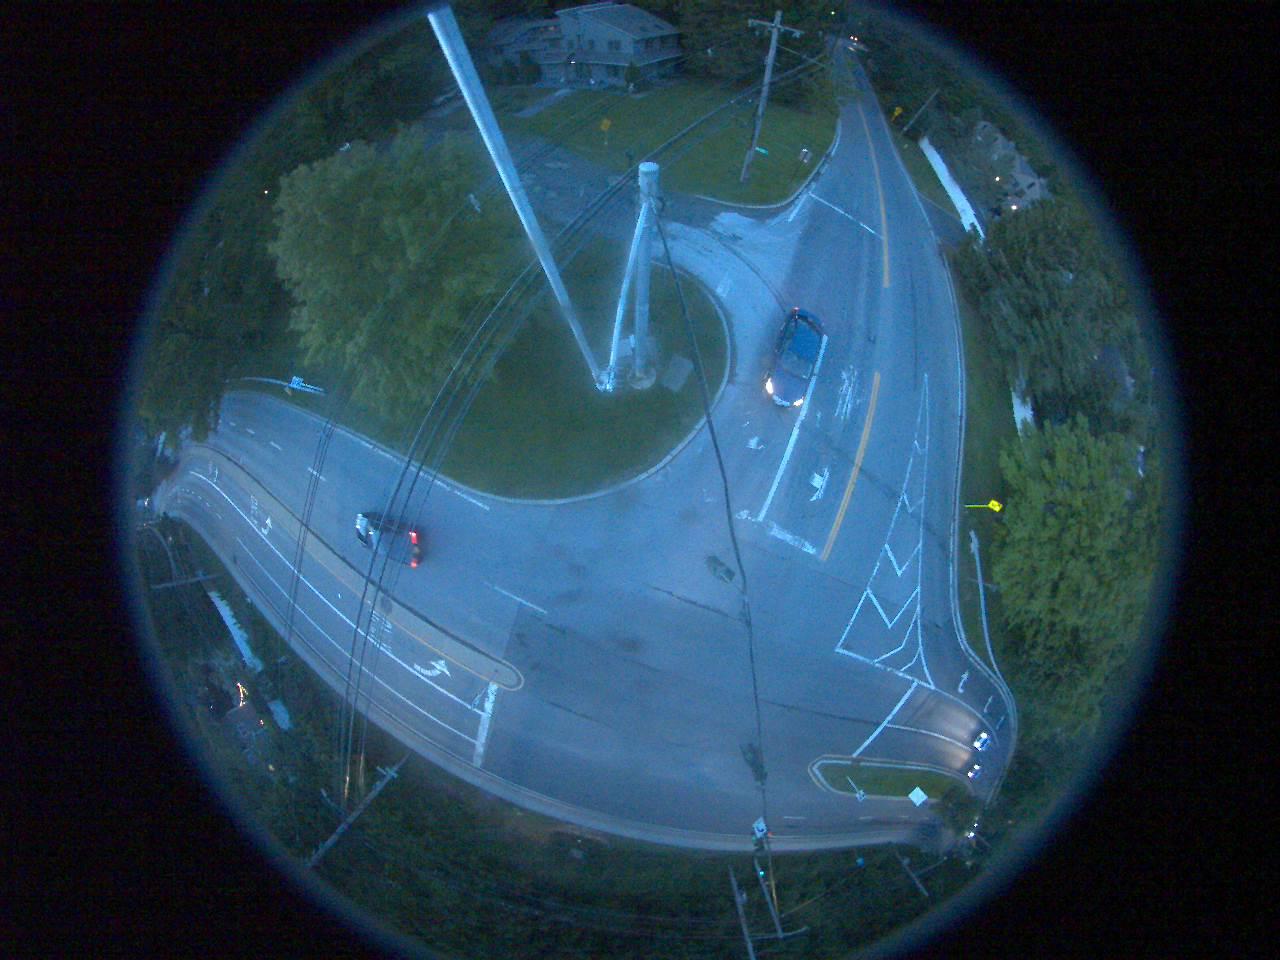 I-95 @ Allings Crossing Rd (8326) - New York City